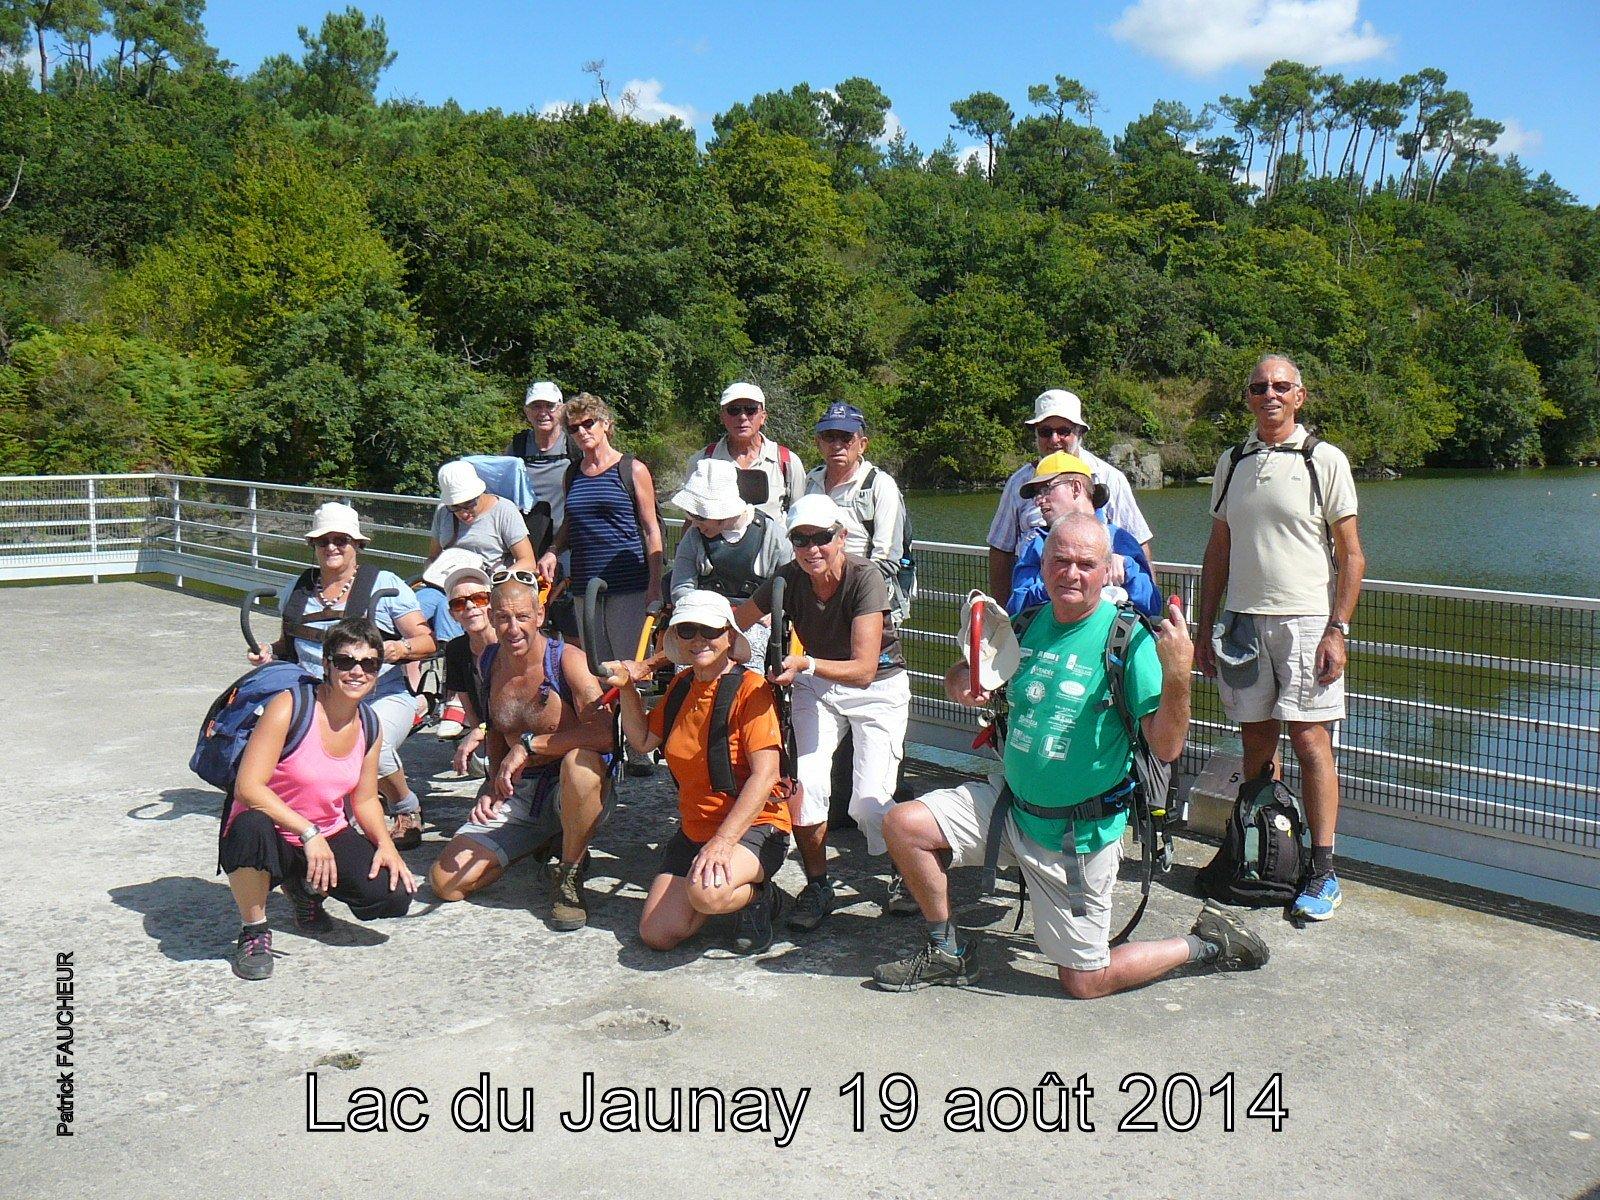 19août2014_ Joëlette au Lac du Jaunay_PF  (43)